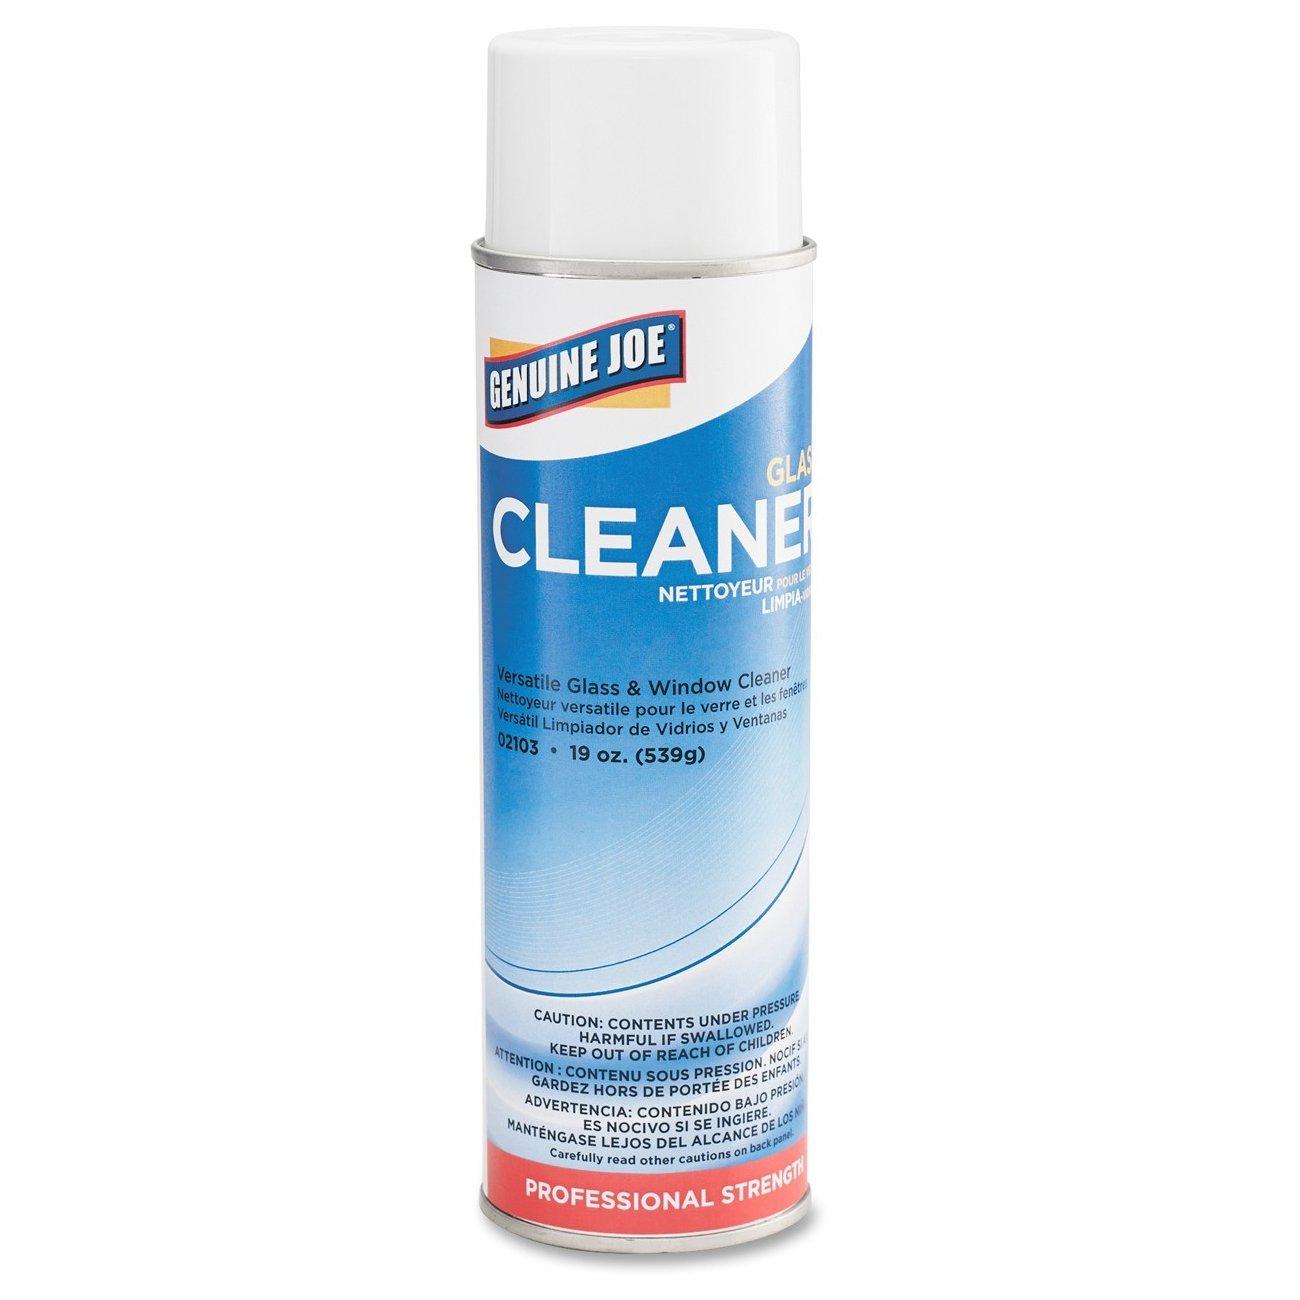 Genuine Joe GJO02103CT Ready-To-Use Glass Cleaner, 19 oz., Aerosol (Pack of 12)